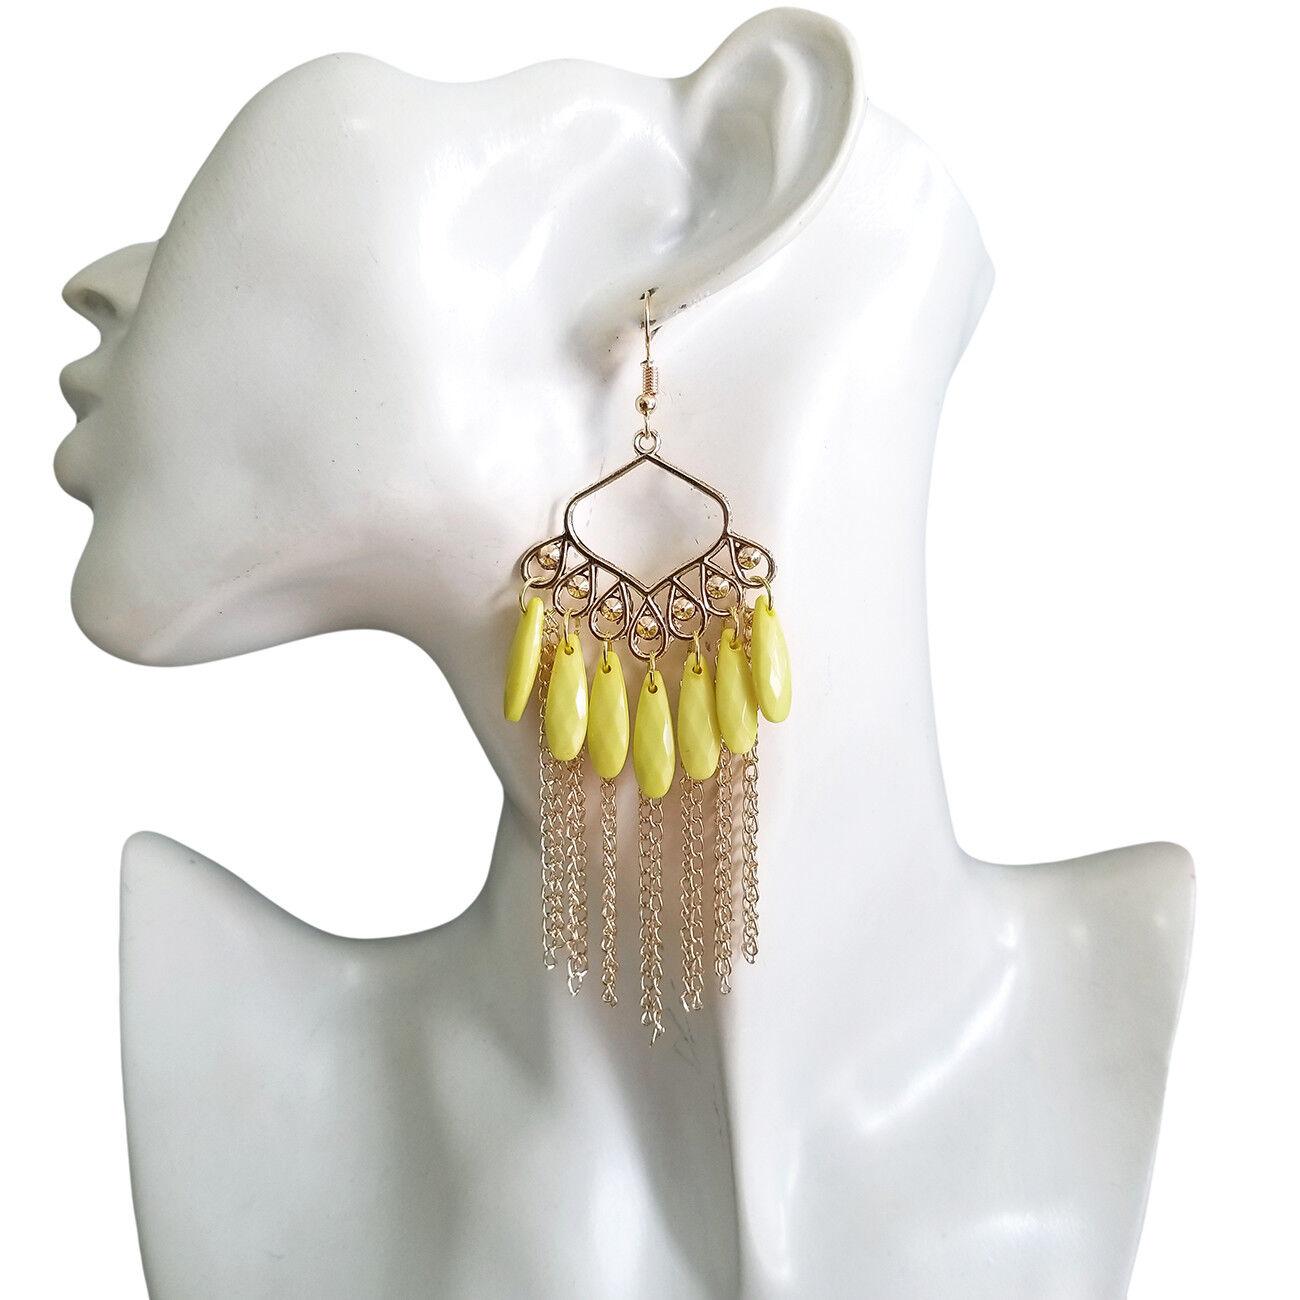 Resin Flower Cabochons Assemblage Jewelry Yellow Bead Earrings Yellow Earrings Vintage Bead Drop Dangle Earrings Silver Plated Hanger